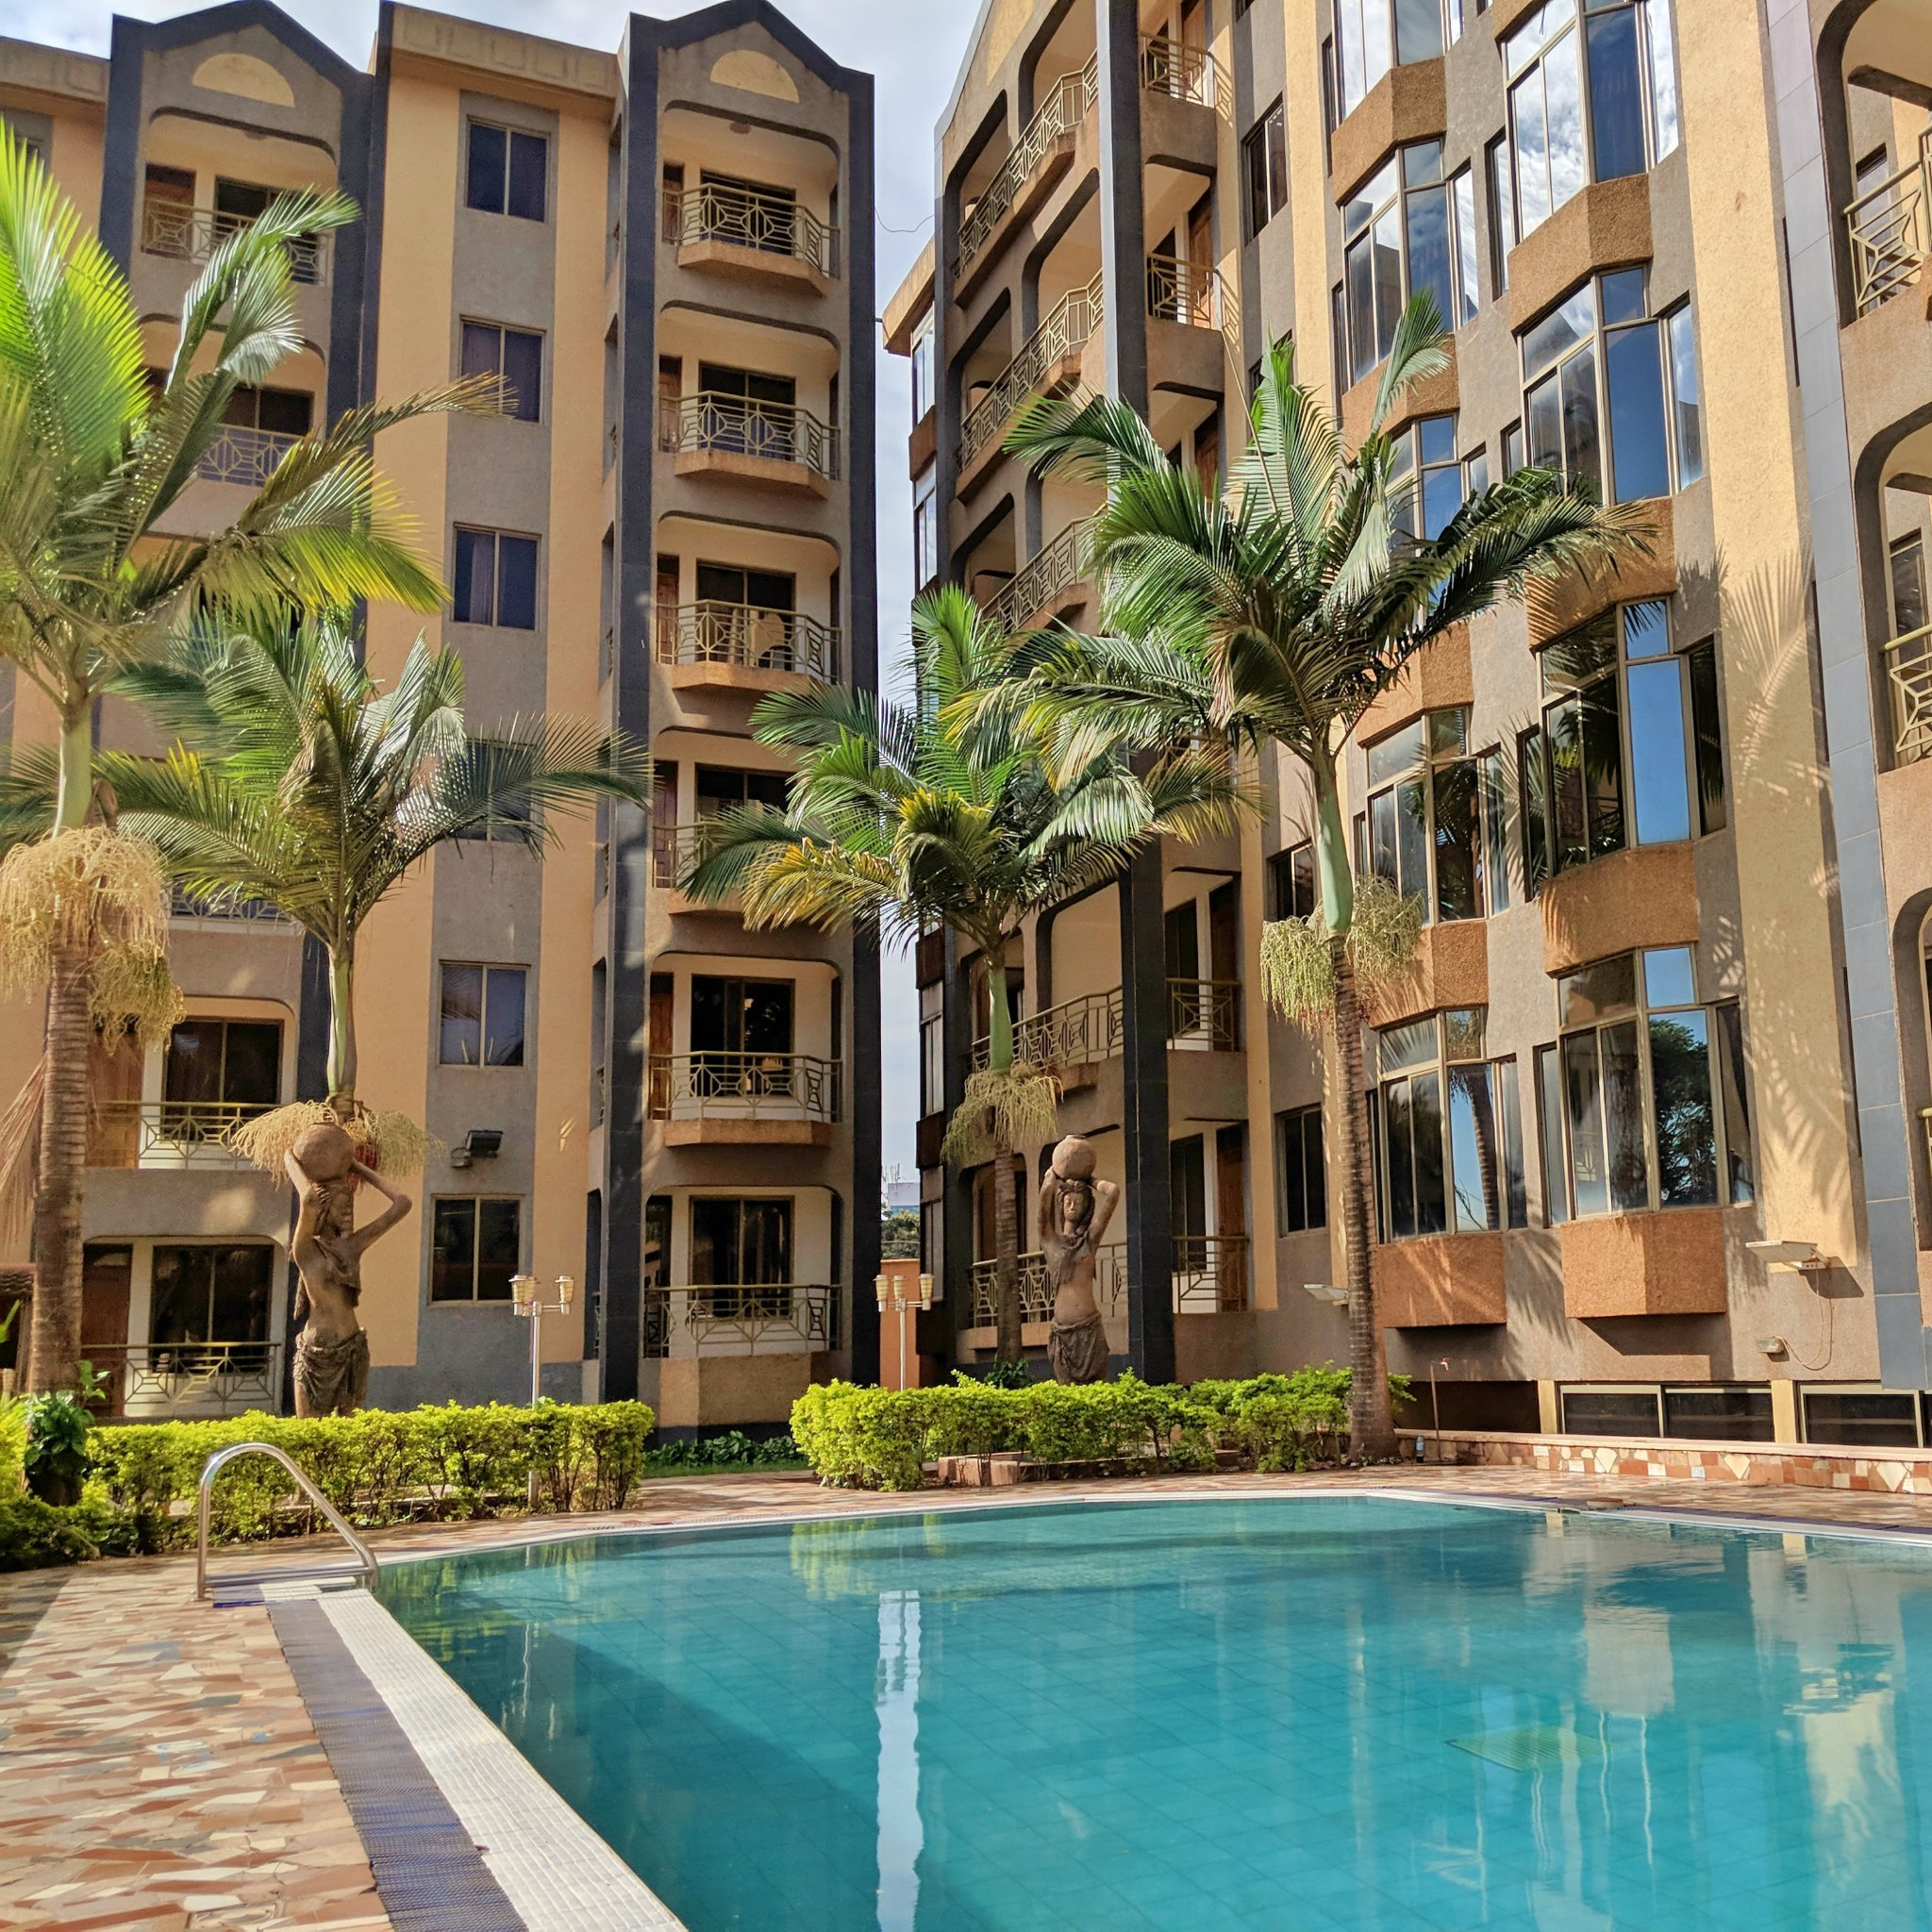 Prestige Hotel Suites Kampala #myprestigemoments